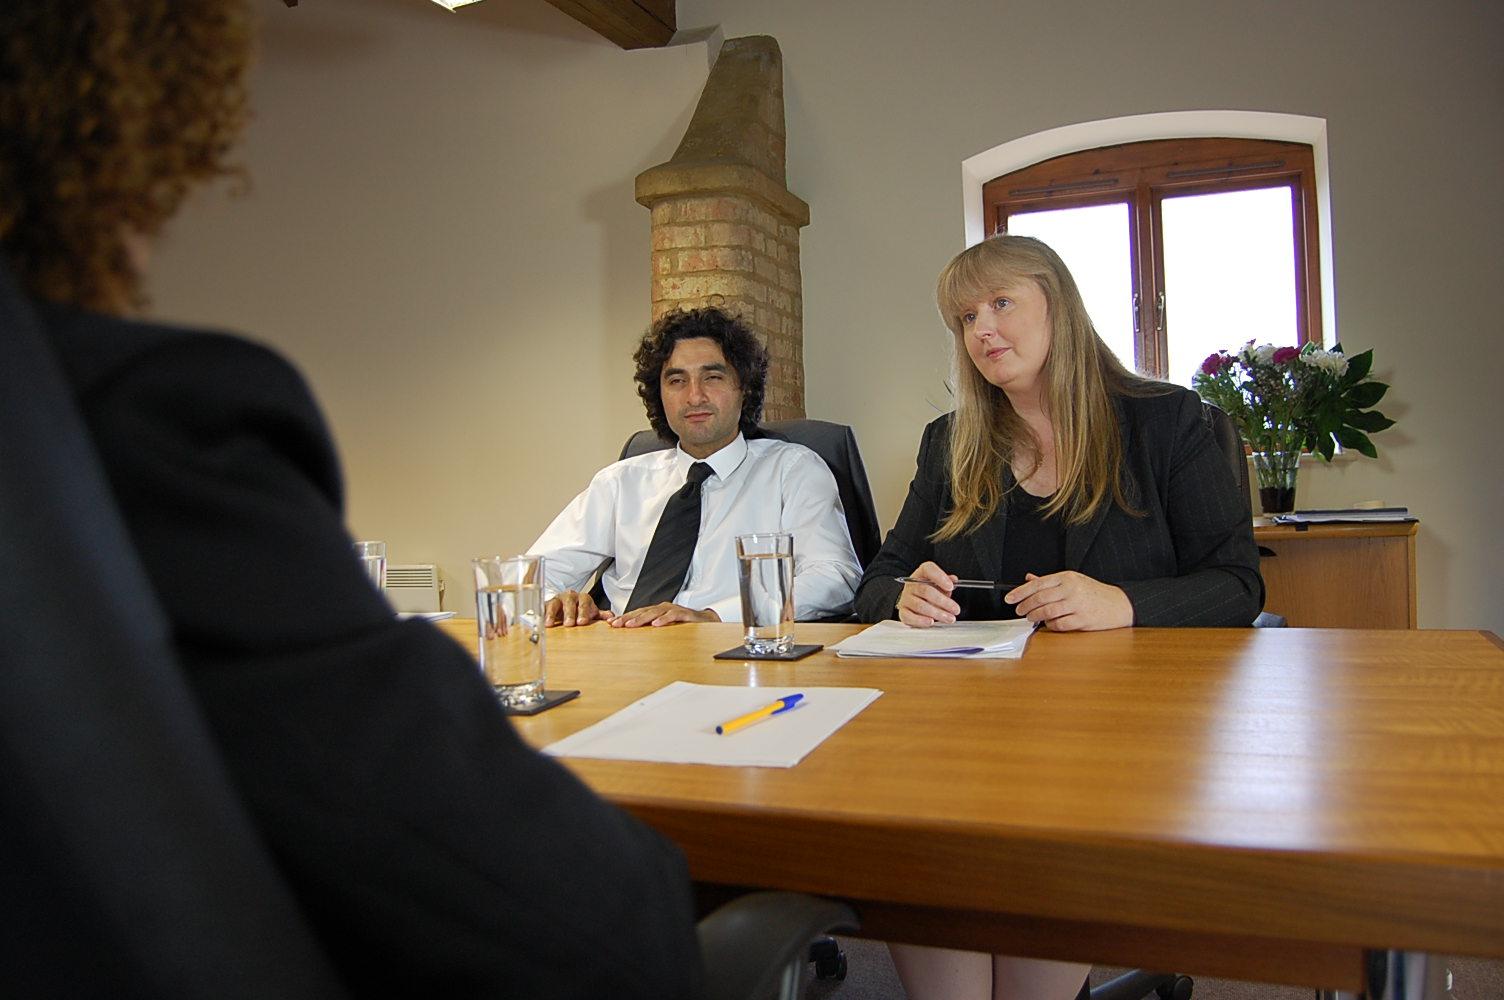 Behavioural Interviewing 1 two interviewers